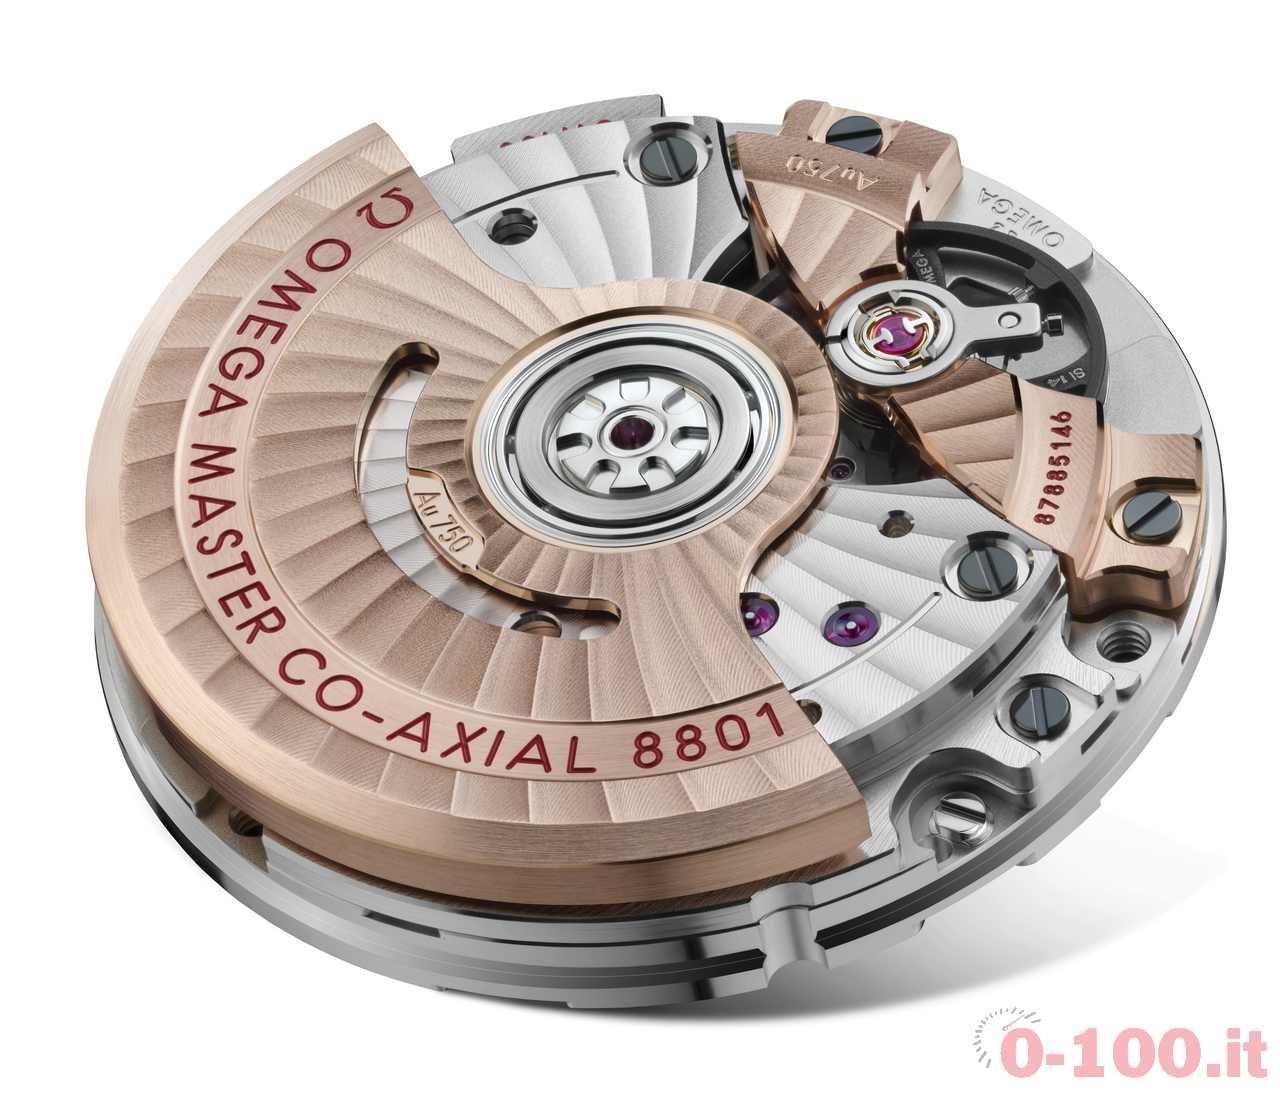 anteprima-baselworld-2016-omega-planet-ocean-600m-master-chronometer-ref-215-63-40-20-13-001prezzo-price_0-1004